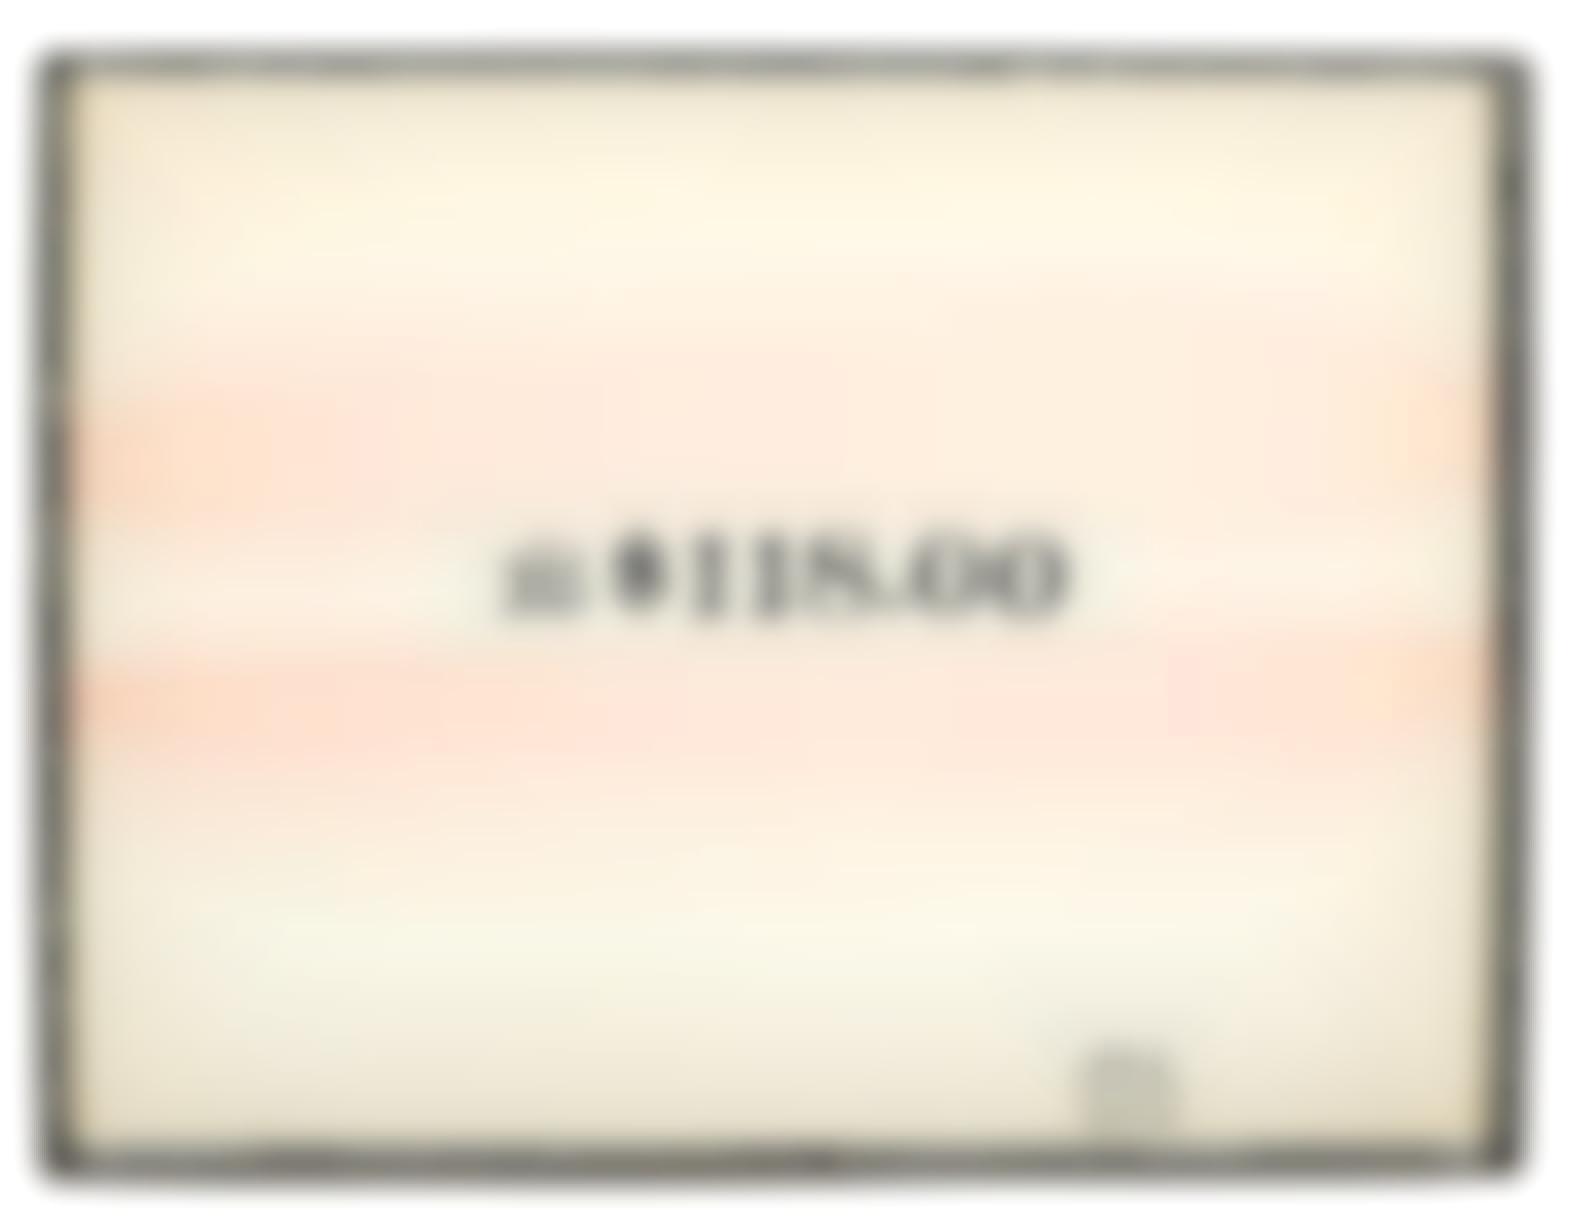 Edward Kienholz-For $118.00-1969